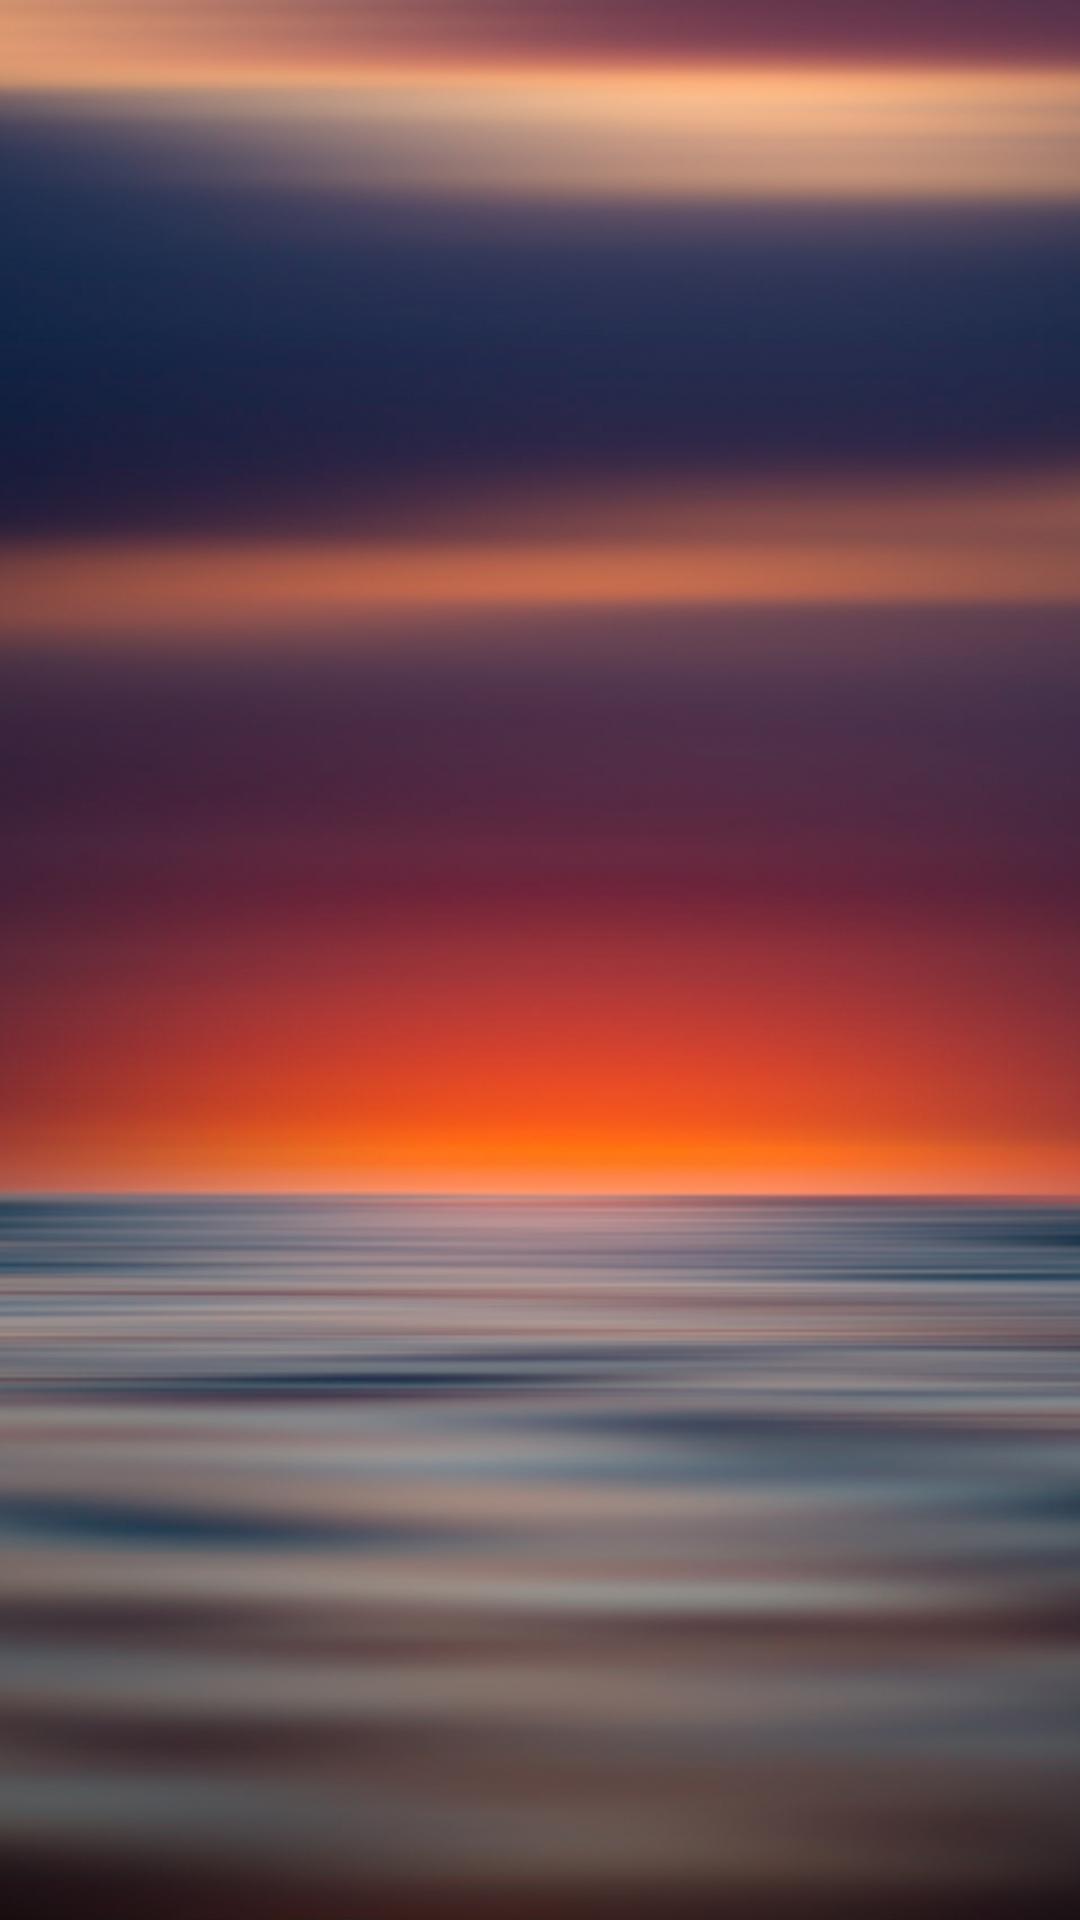 Wet Sunrise Iphone Wallpaper - Iphone 8k - HD Wallpaper